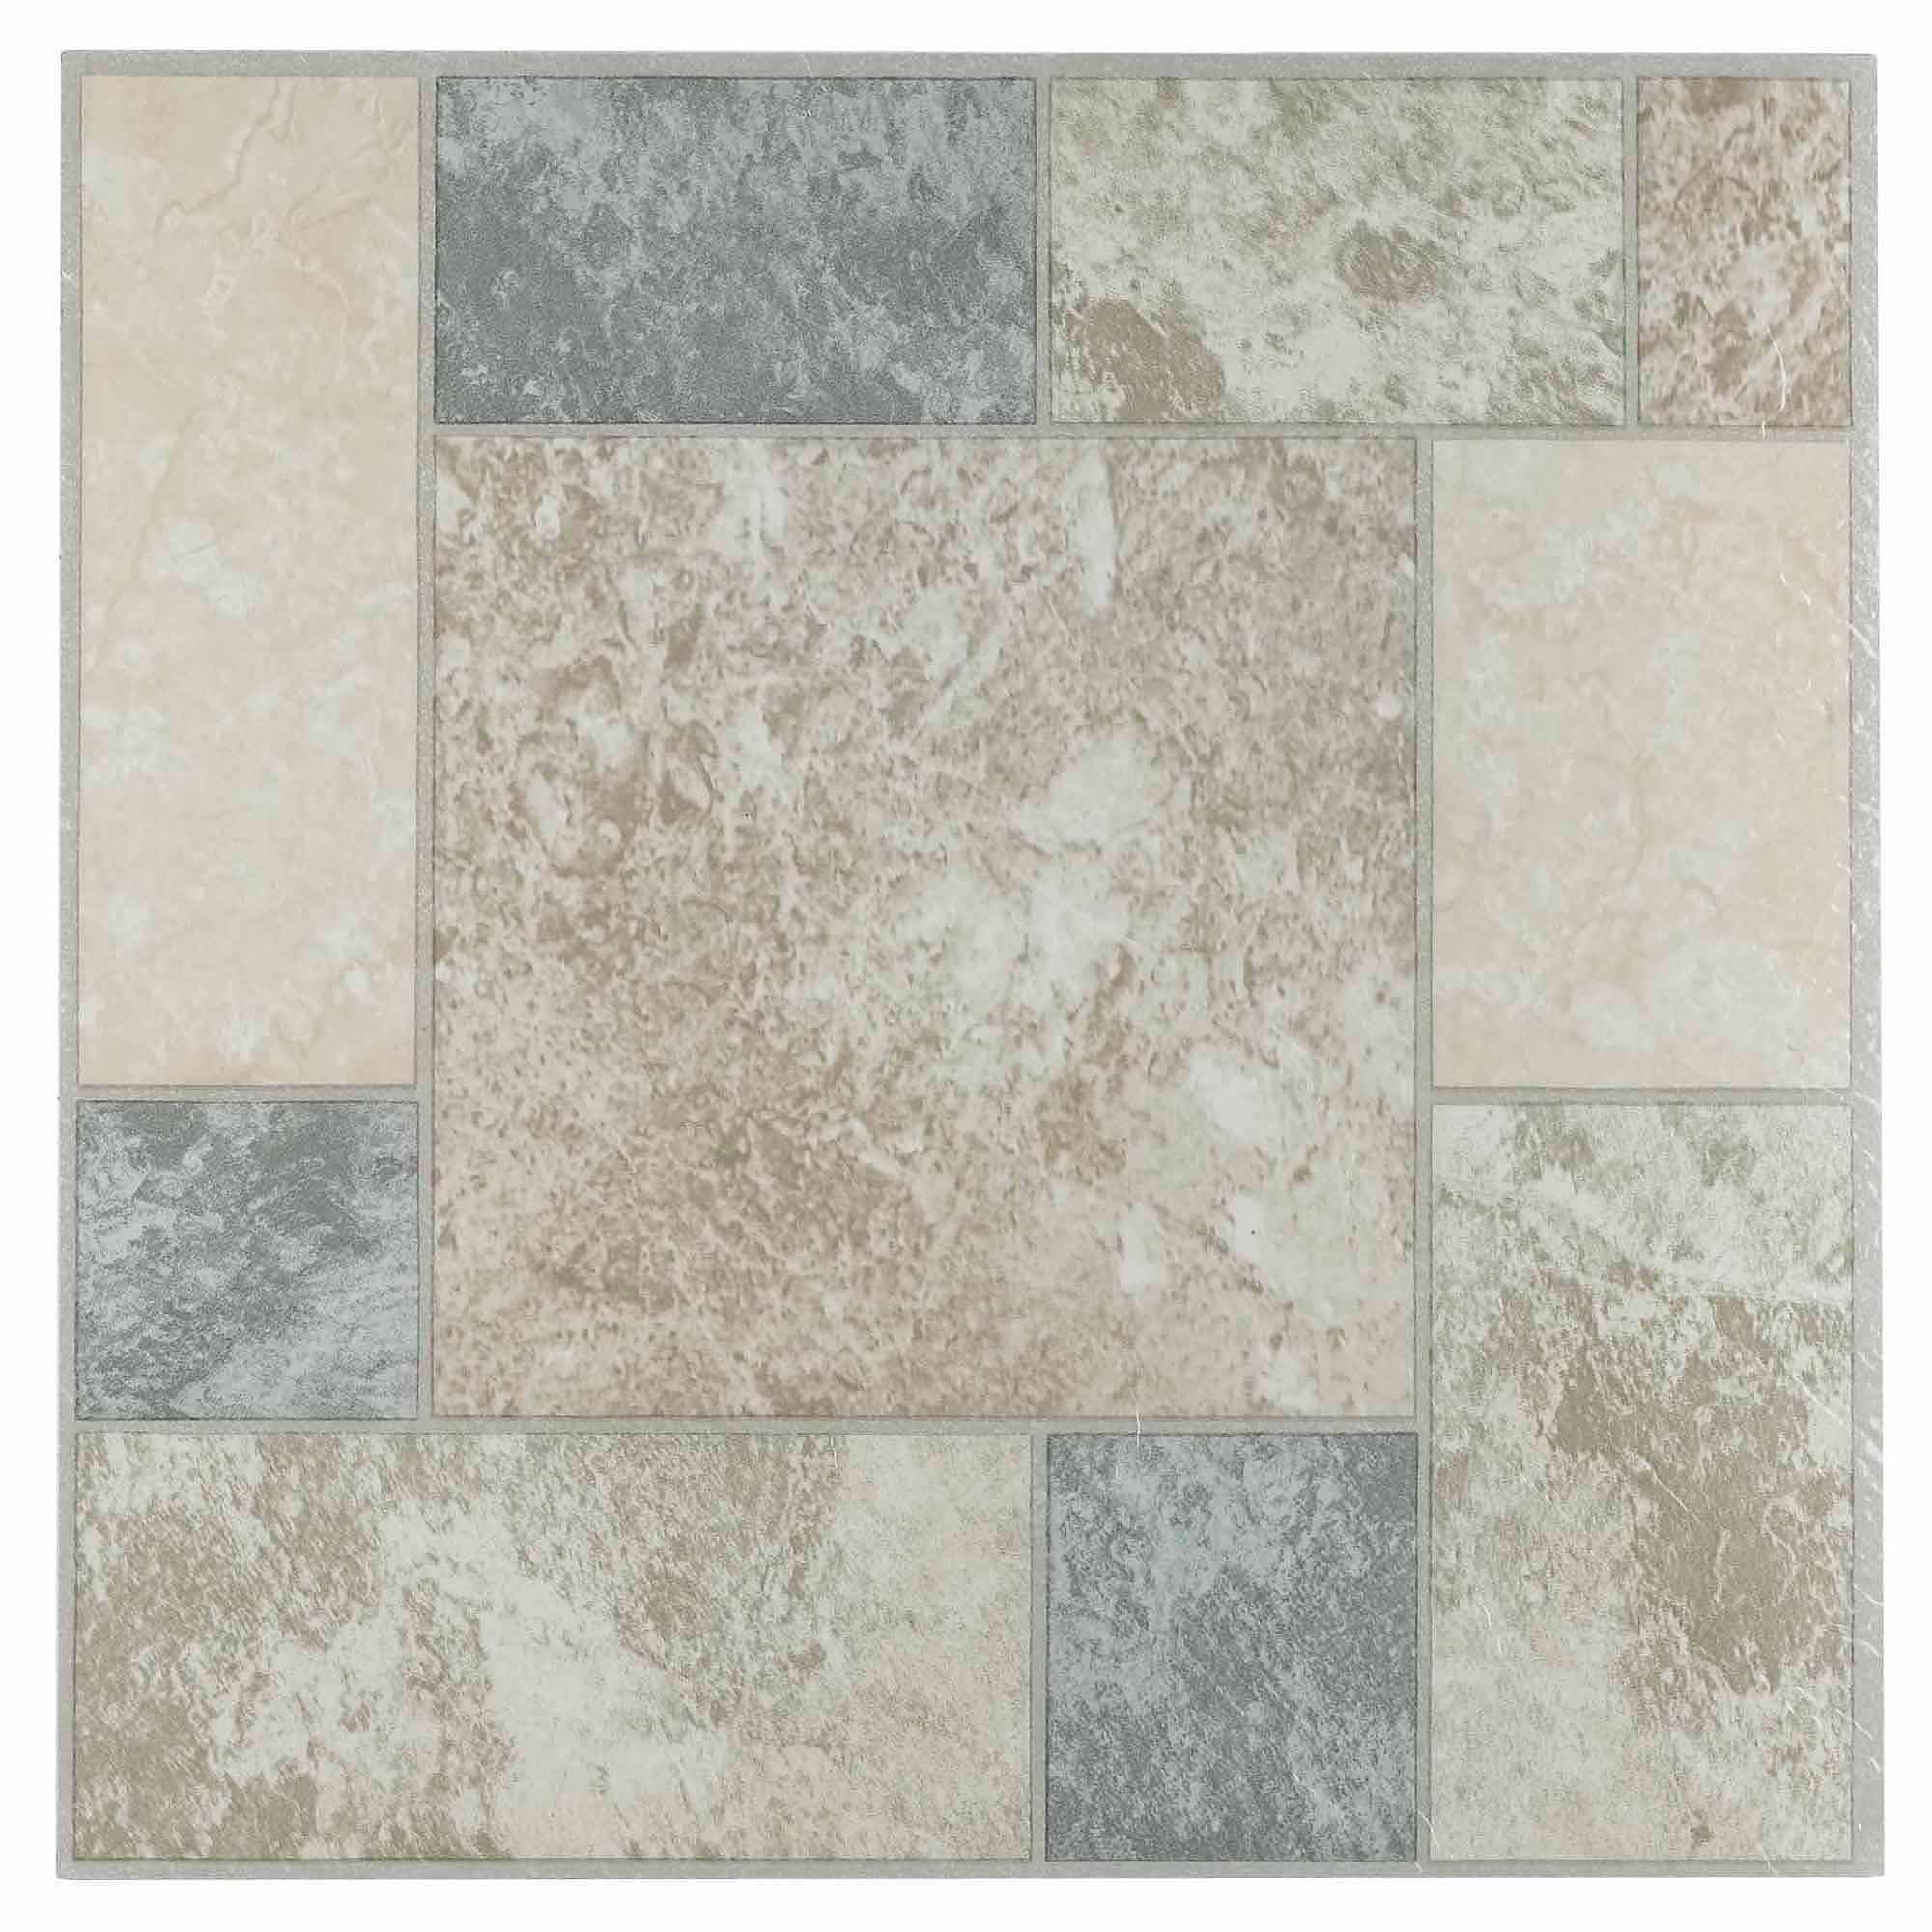 vinyl floor tiles nexus marble blocks 12x12self adhesive vinyl floor tile - 20 tiles/20  sq.ft. XMNSZYN